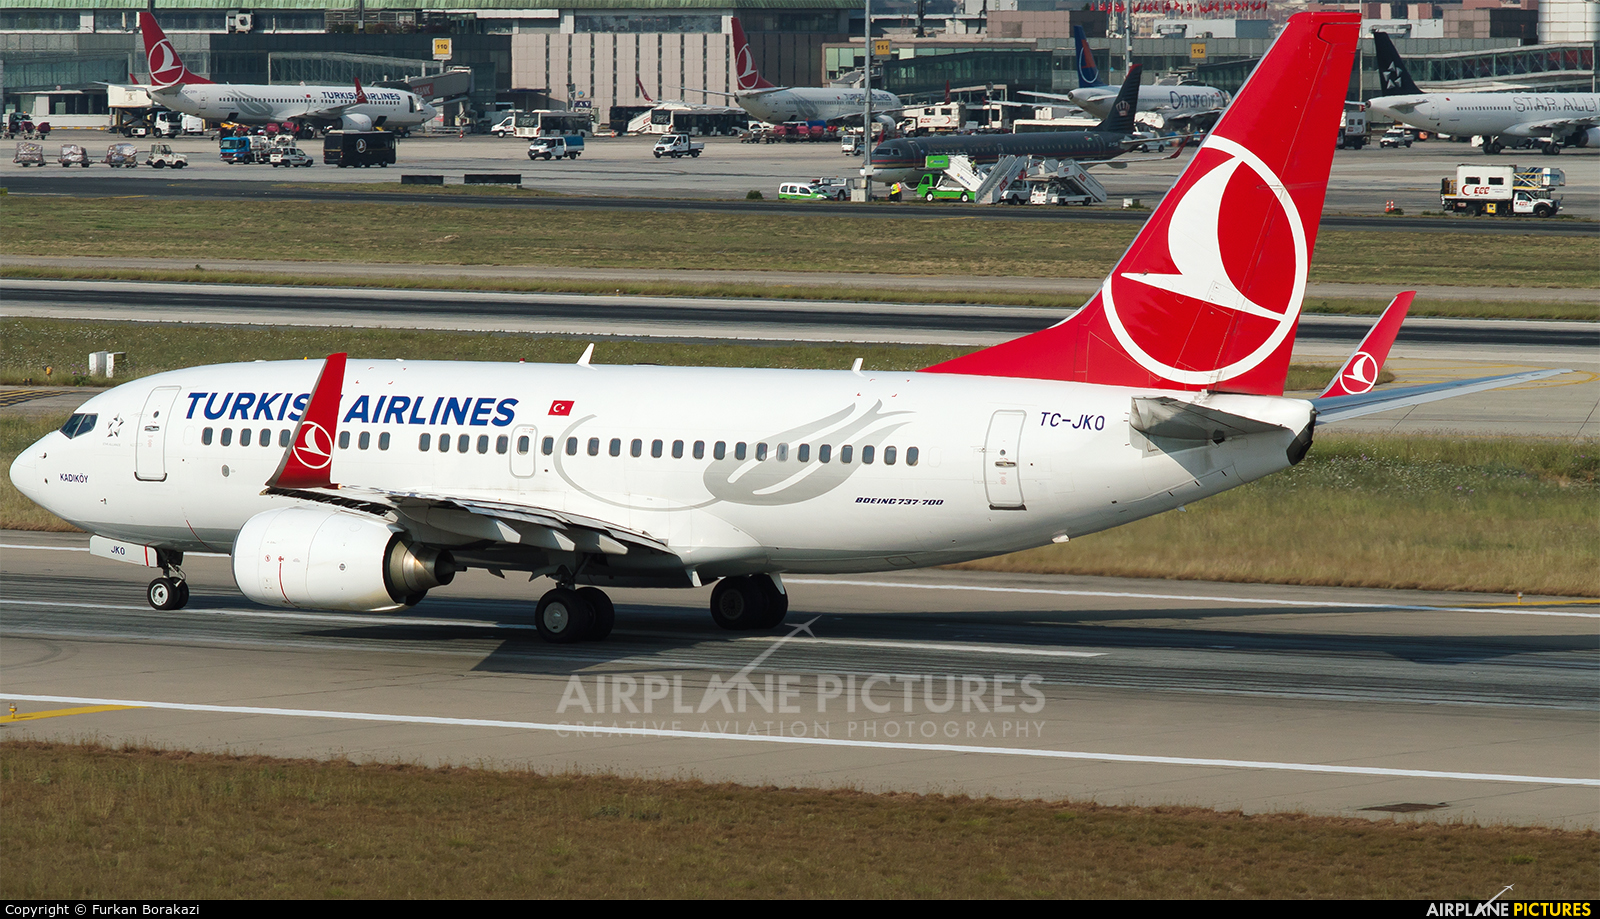 Turkish Airlines TC-JKO aircraft at Istanbul - Ataturk